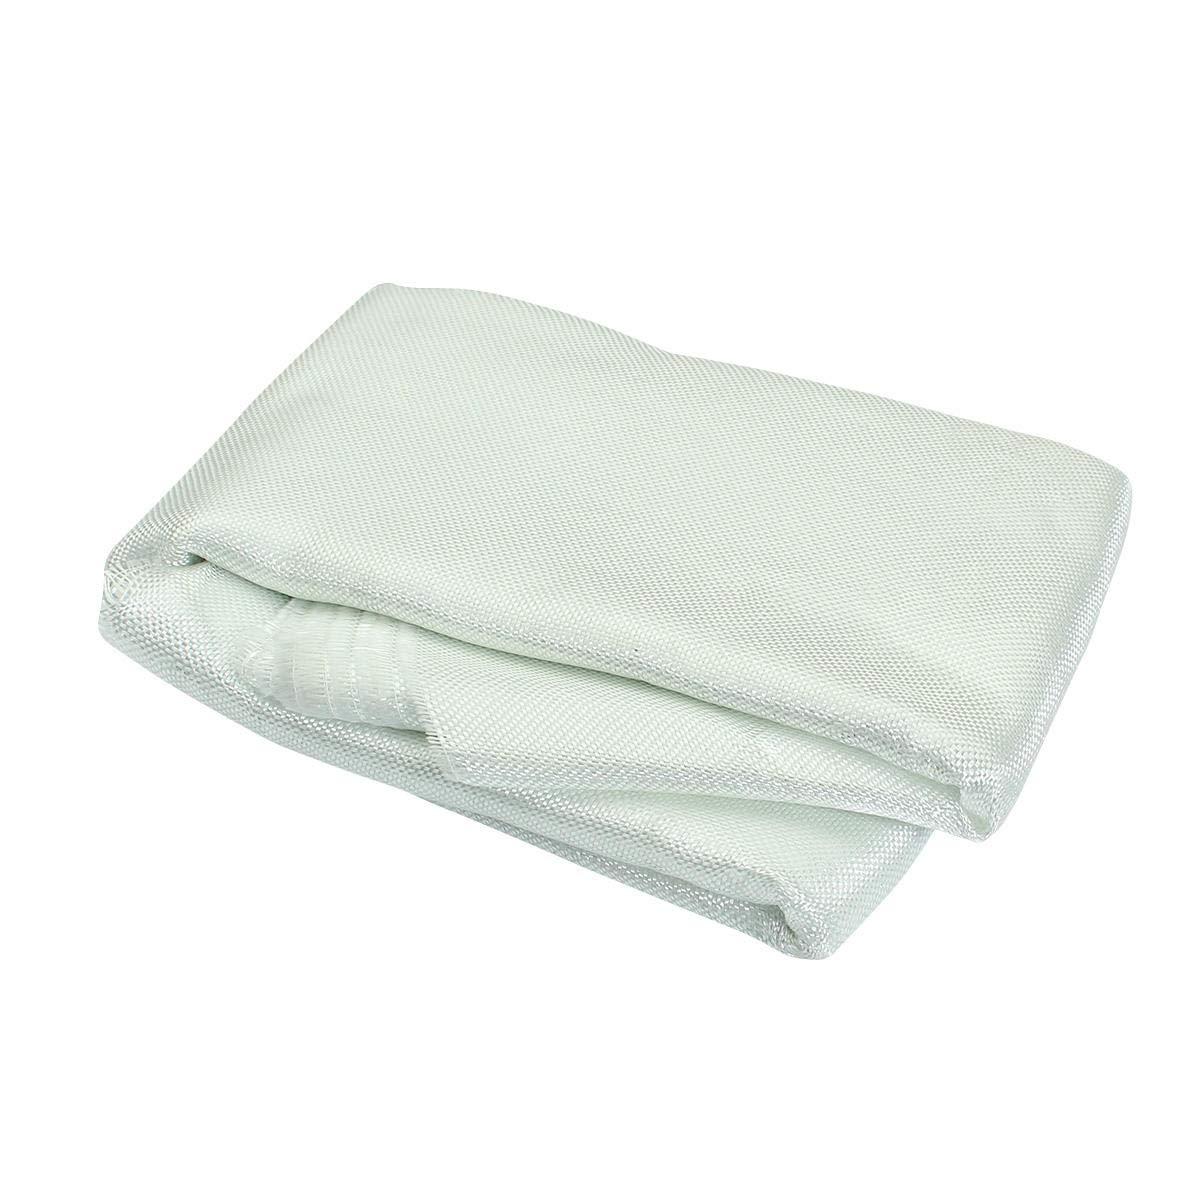 Stock_Home, Raw Materials, 10x1m Fiber Glass Cloth Fabric Plain Woven Roving Cloth for Model Airplane